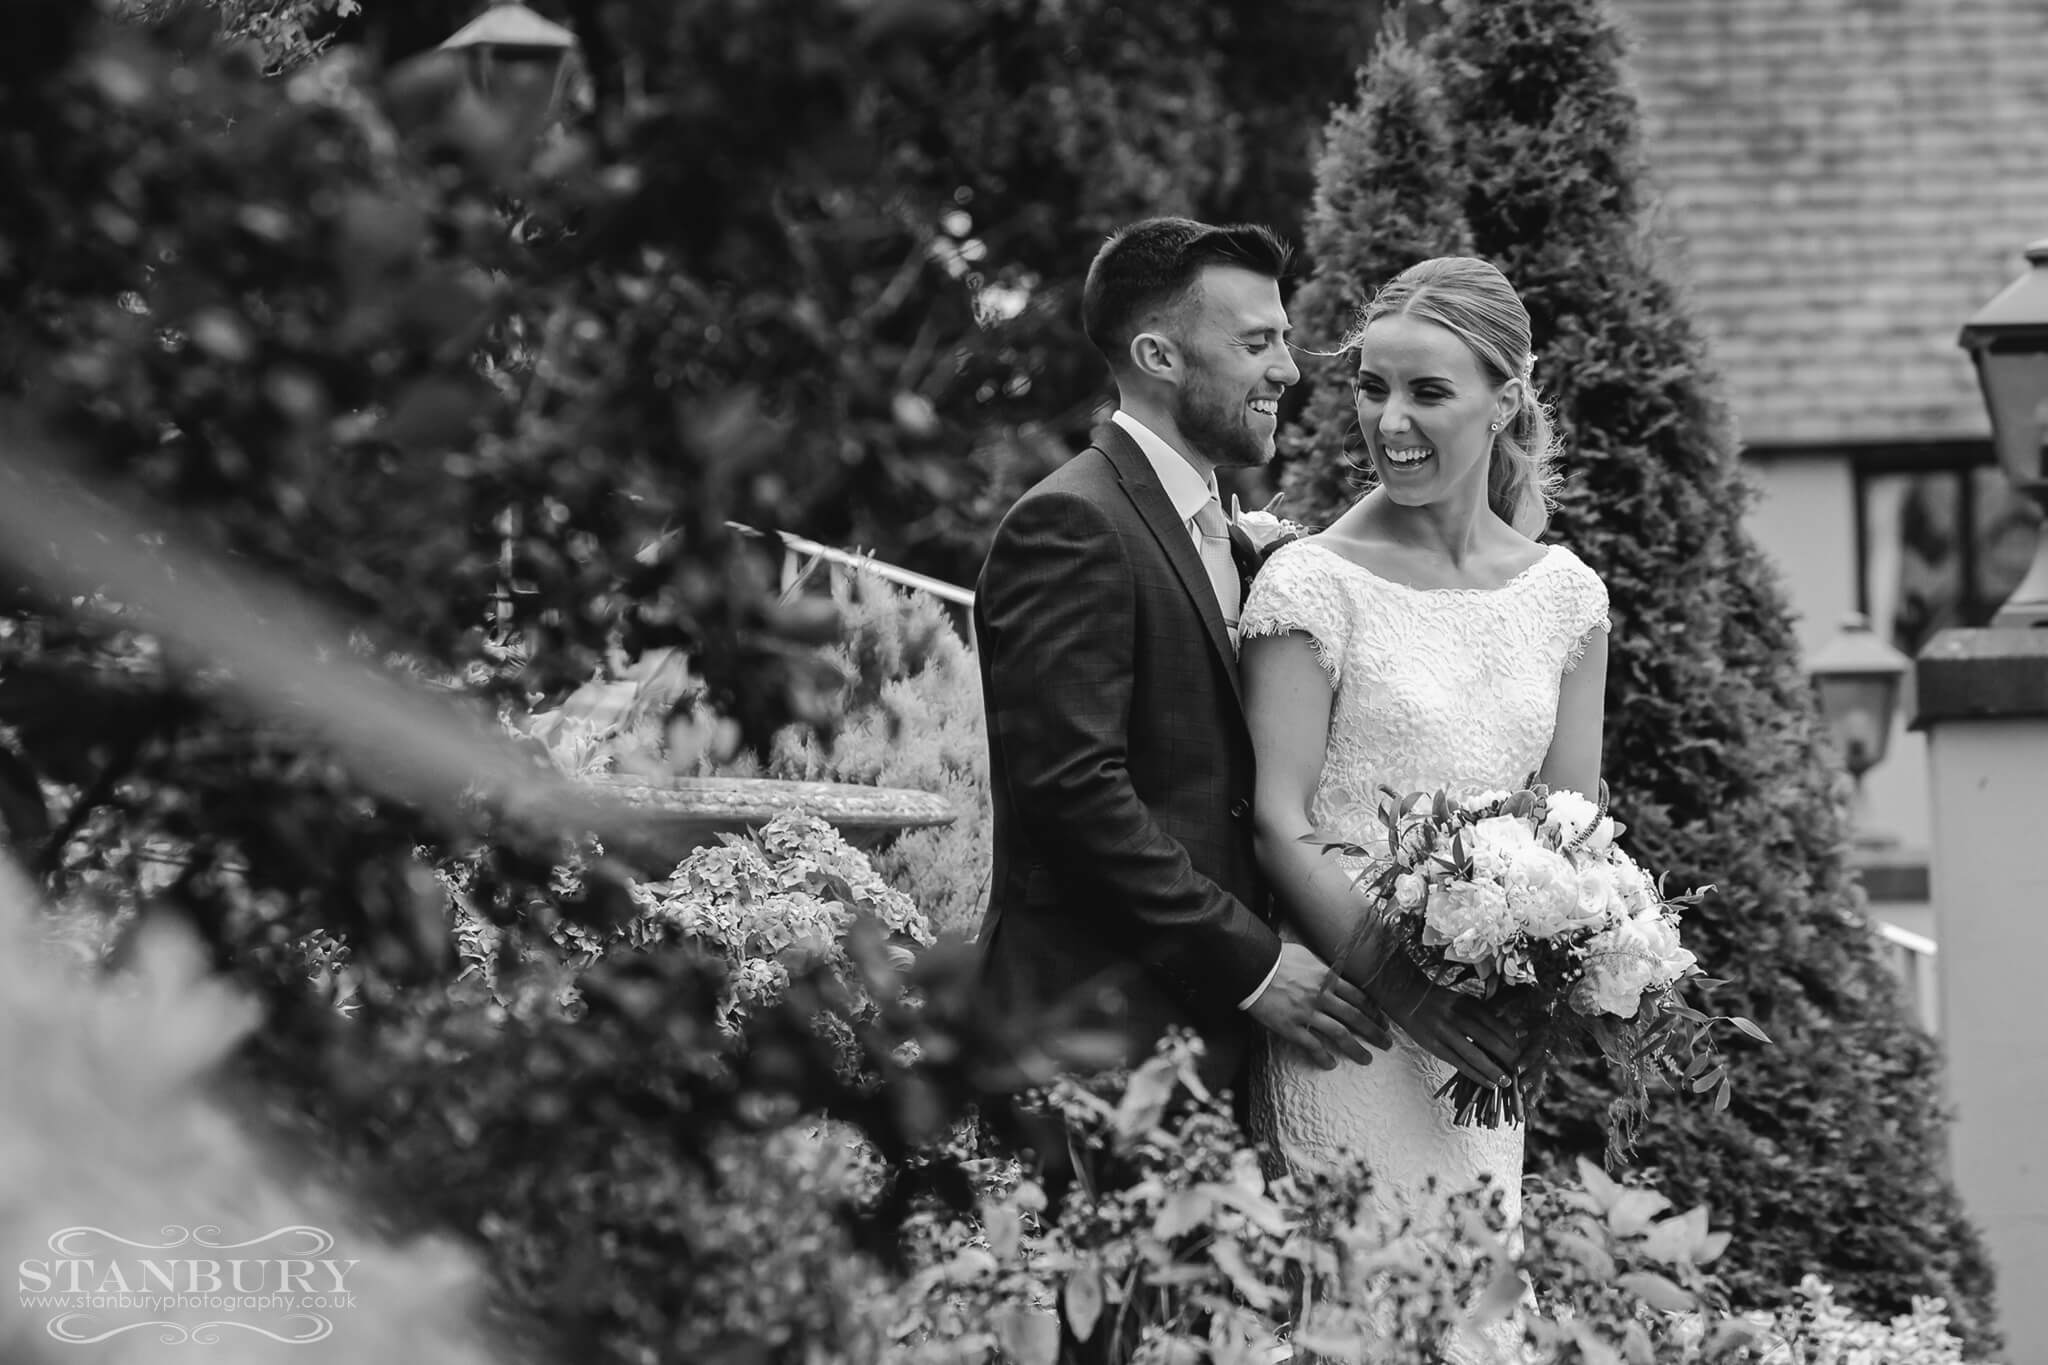 west-tower-wedding-photographers-stanbury-photography